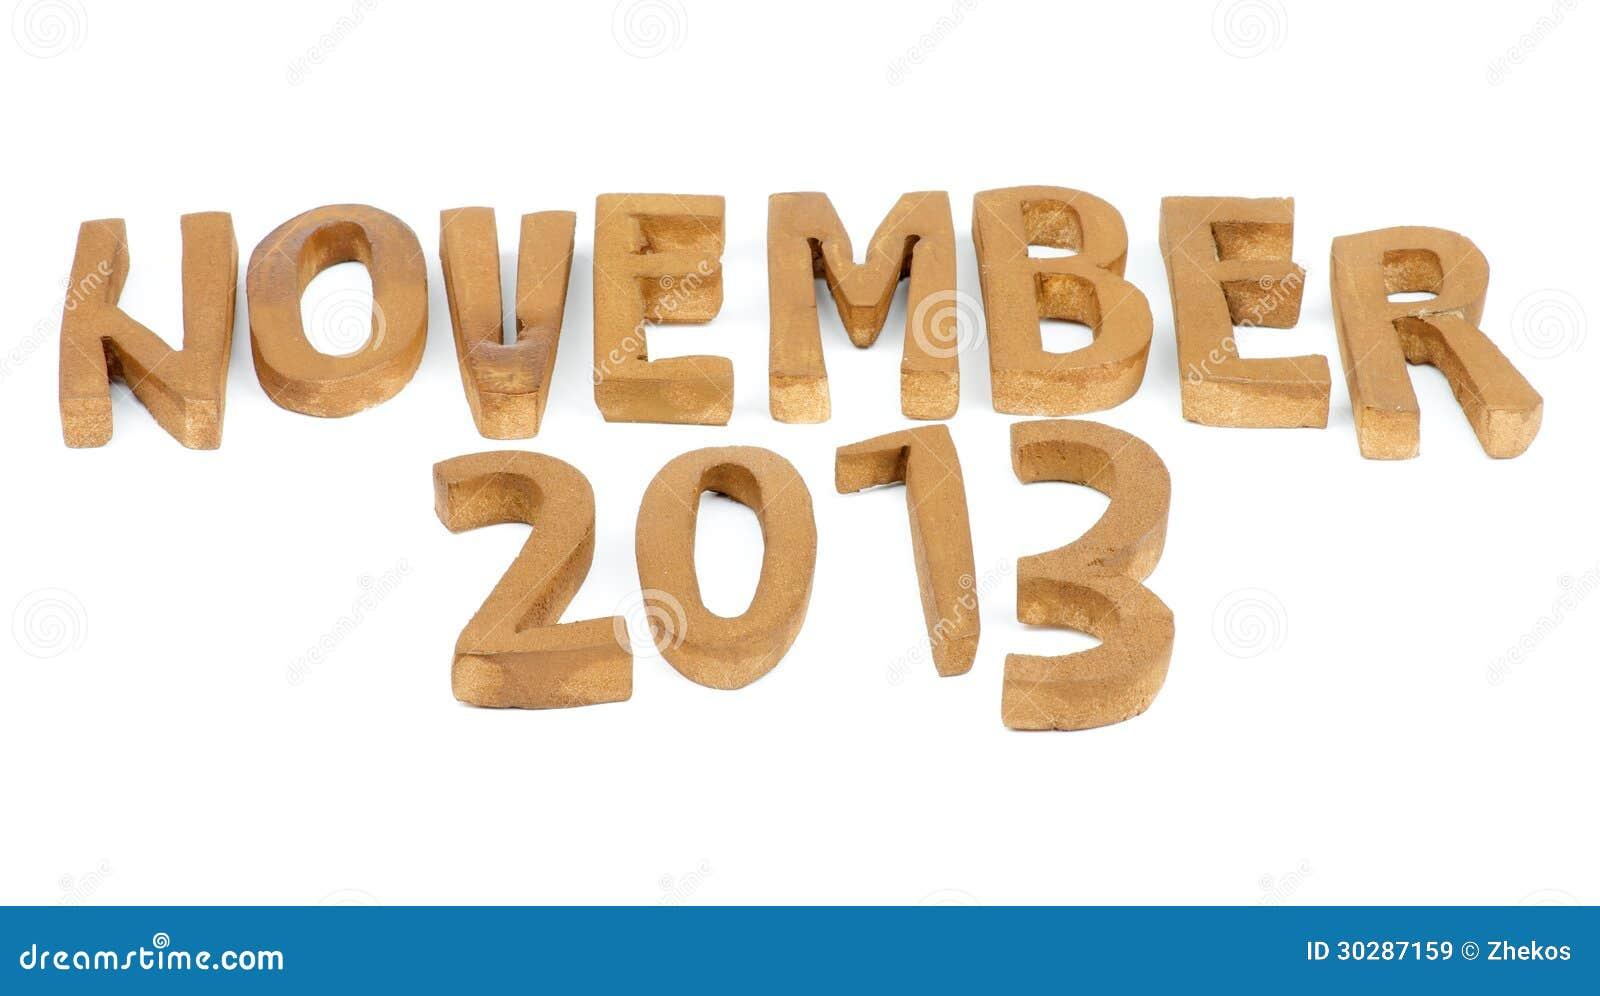 november 2013 free - photo #32